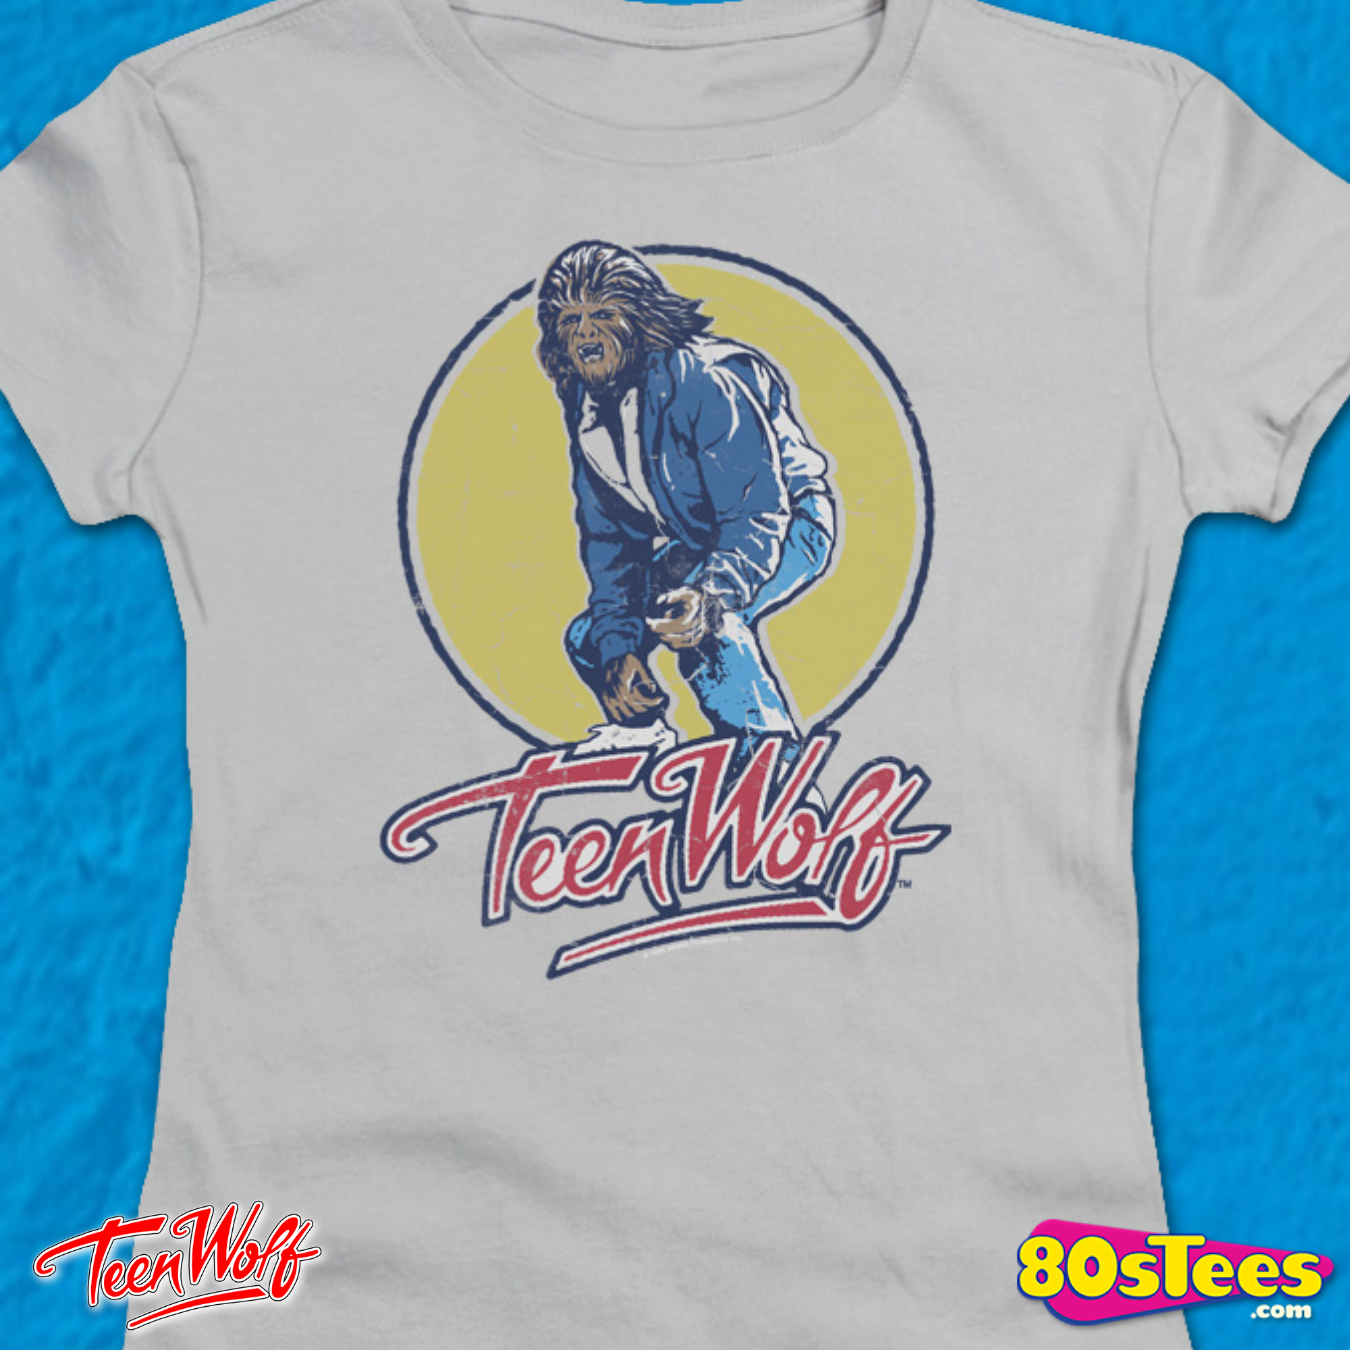 Children/'s Tee Shirt  featuring  SURF LIVE IN A VAN quality Kids T Shirt JAM